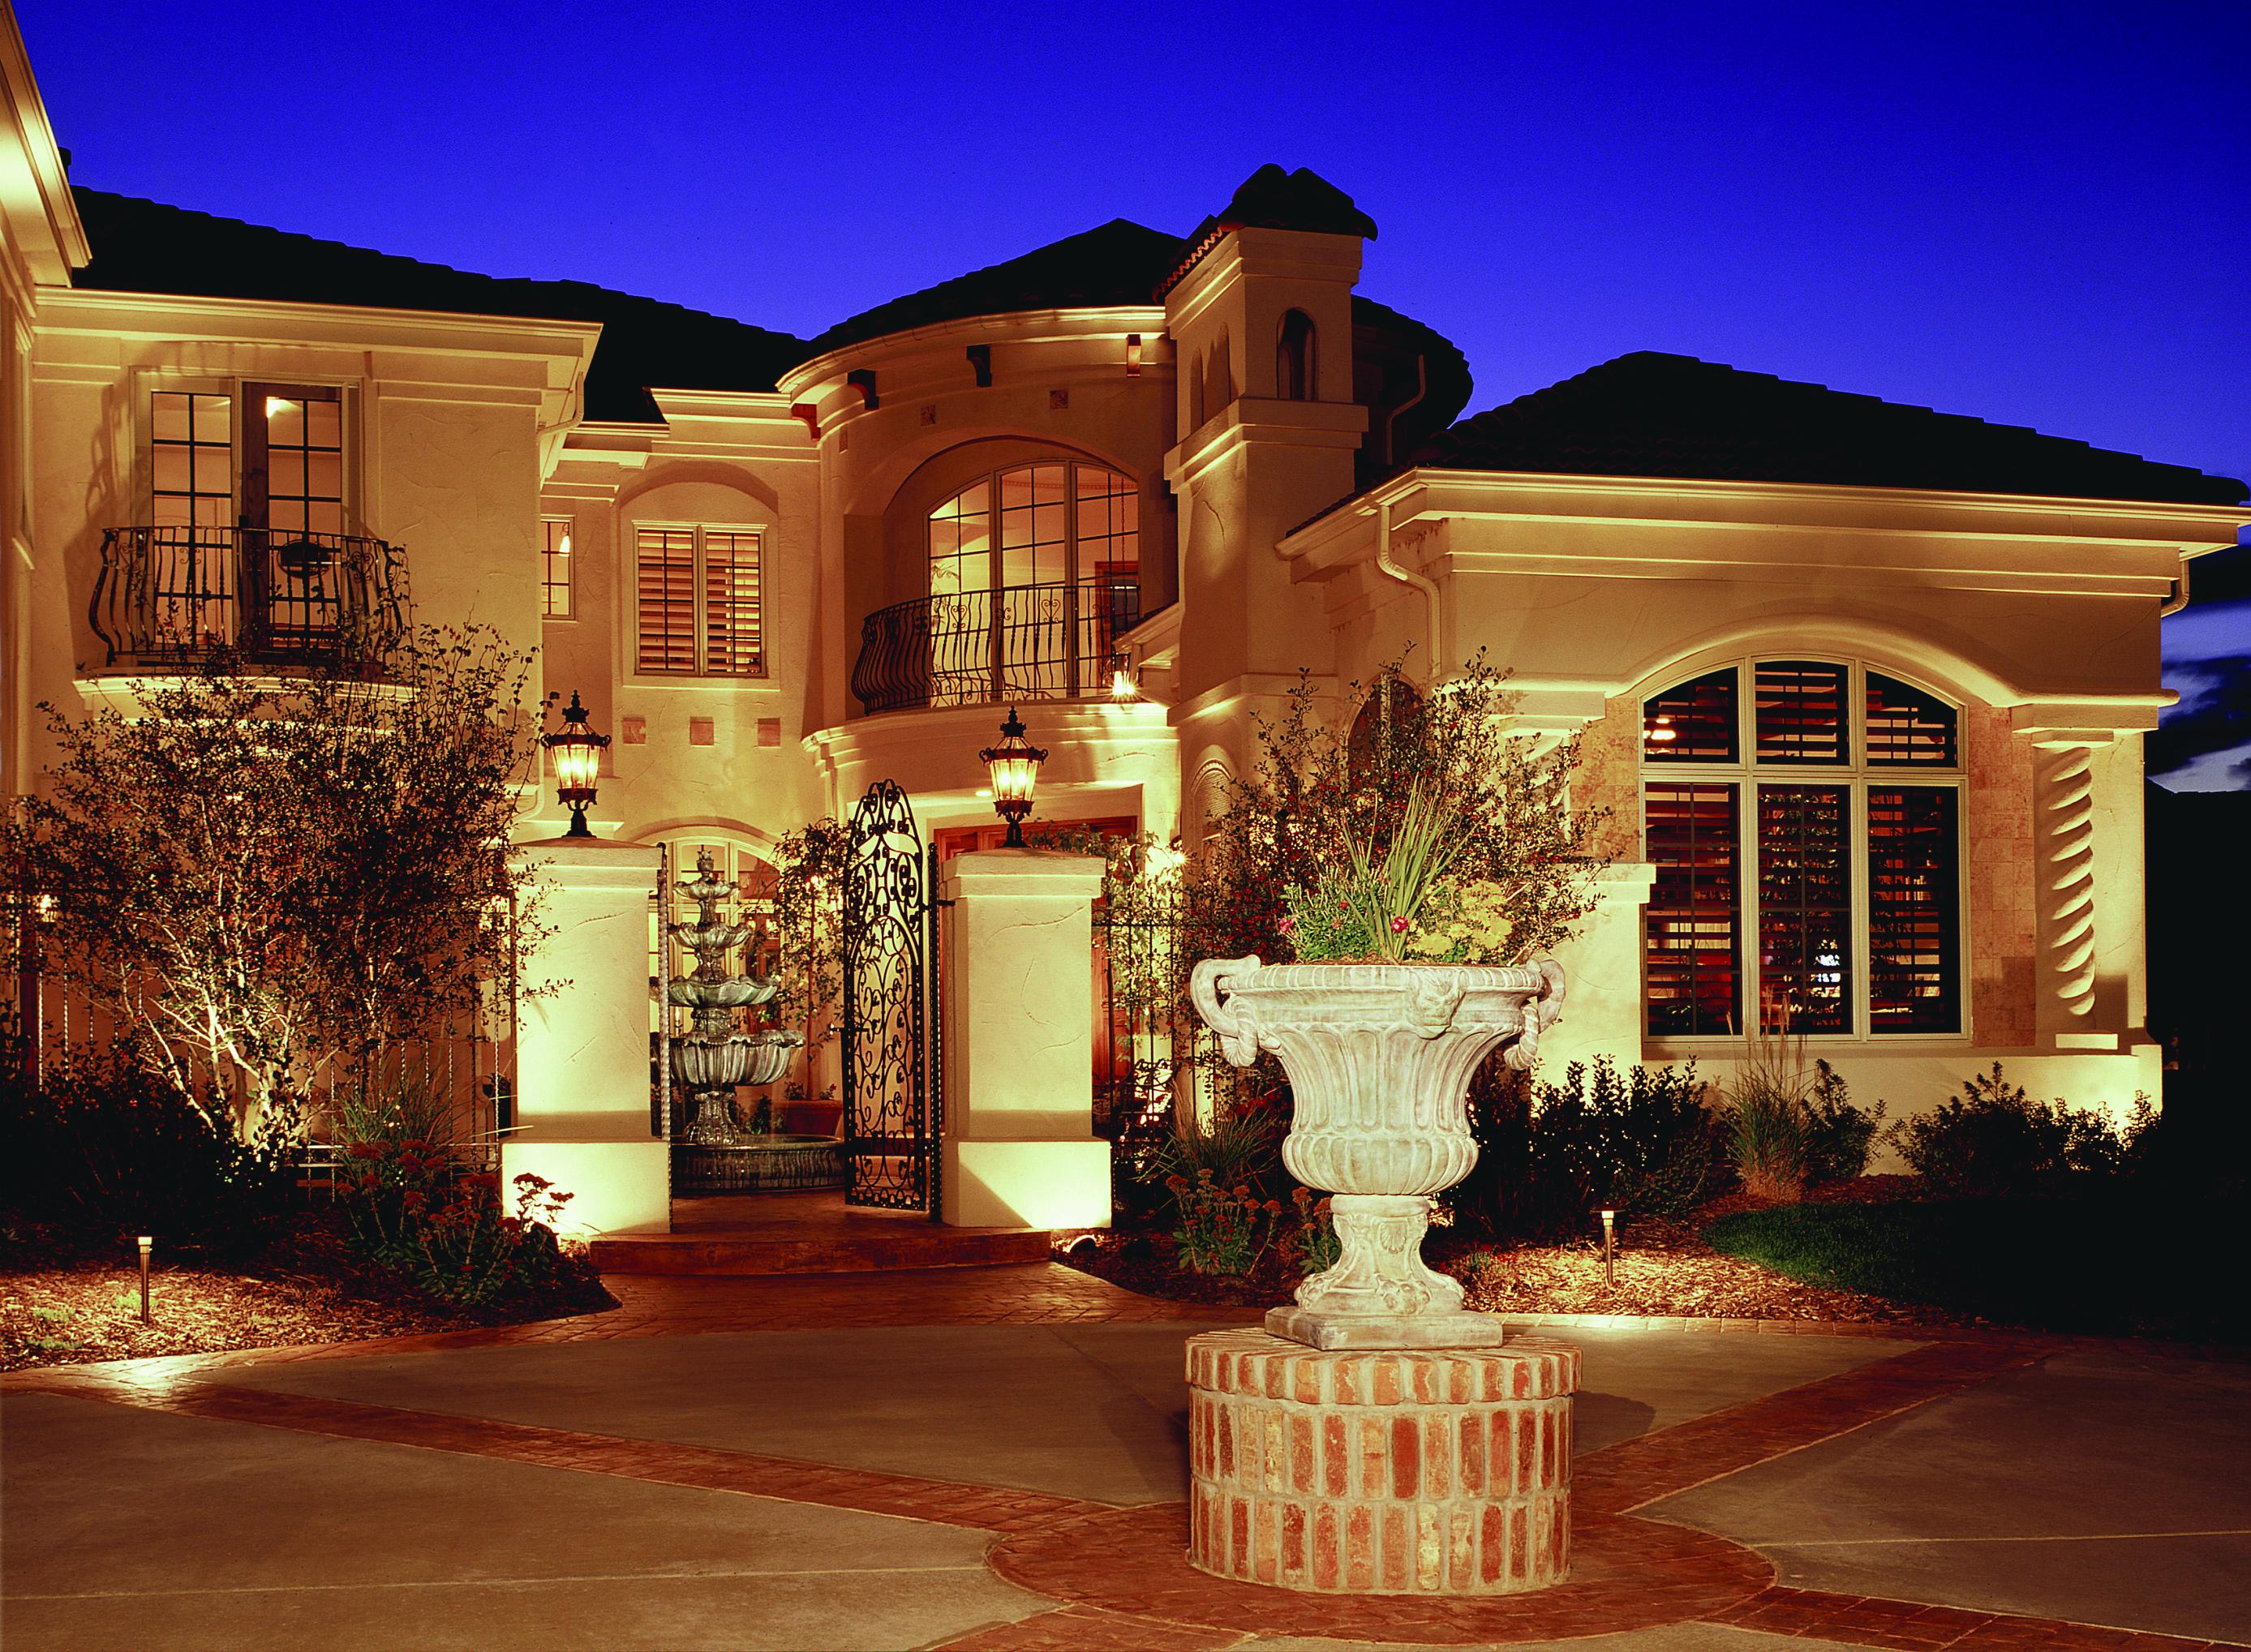 Outdoor lighting turns tampa bays homes into eye catching tampa bay architectural lighting aloadofball Choice Image